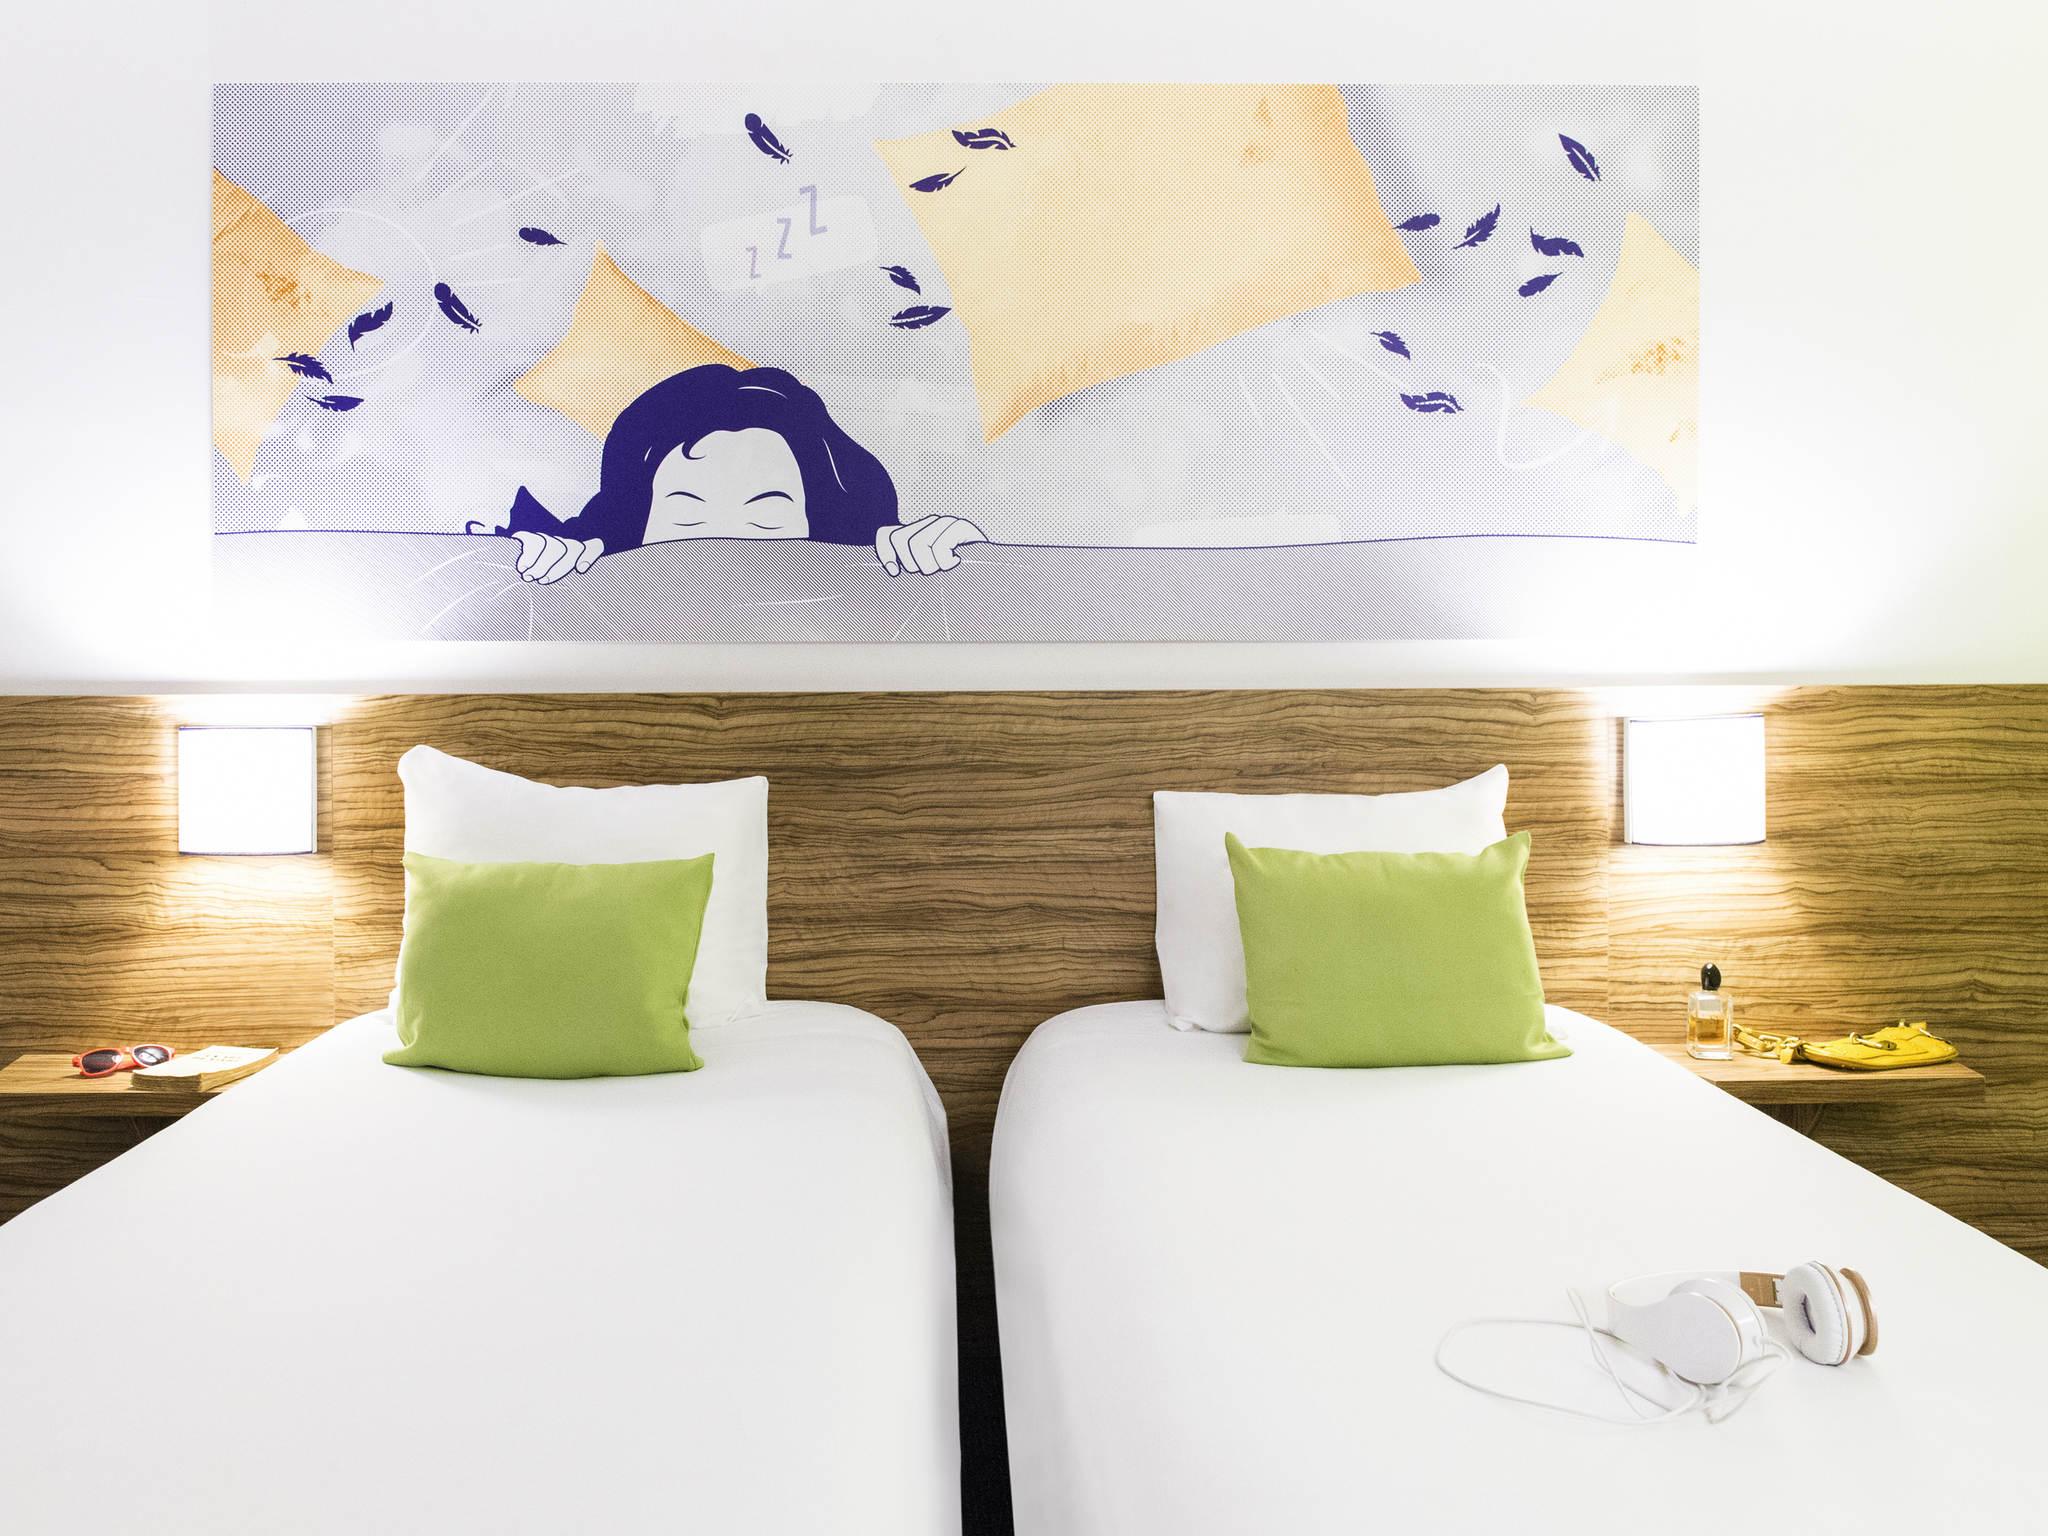 IBIS STYLES HOTEL MEETING CENTER LOUVAINLANEUVE